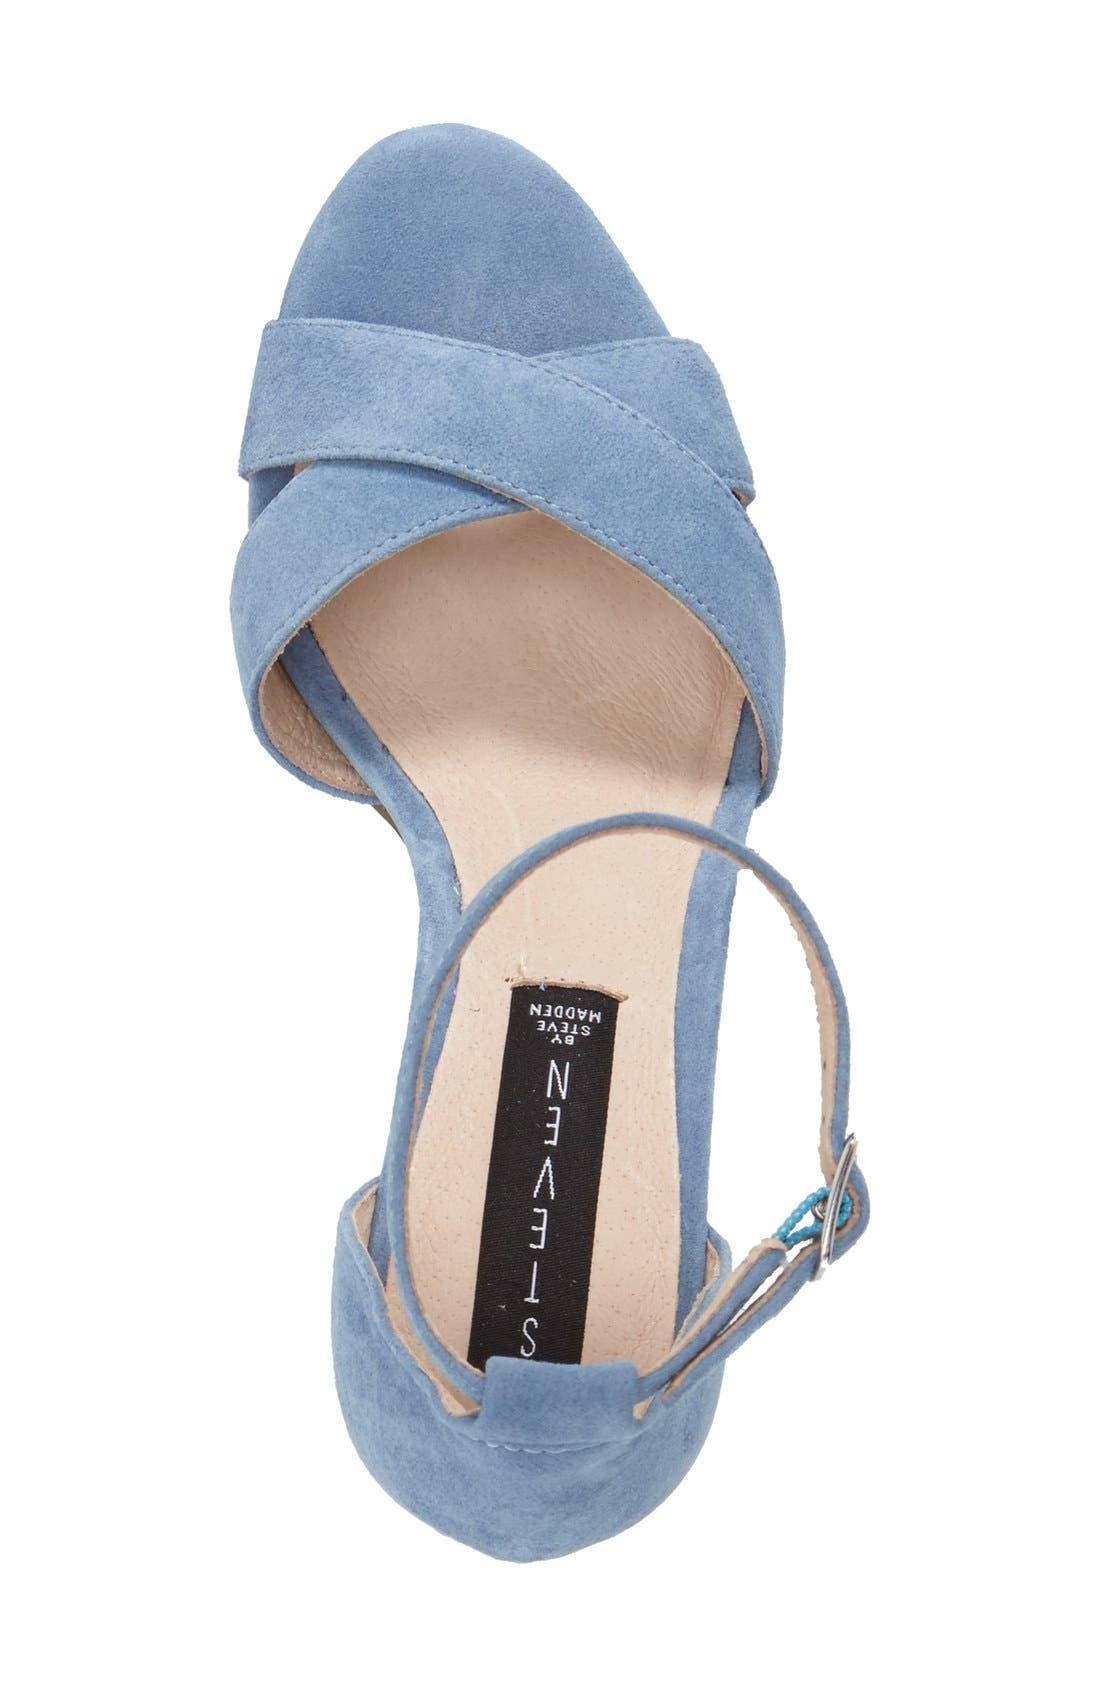 'Voomme' Ankle Strap Sandal,                             Alternate thumbnail 15, color,